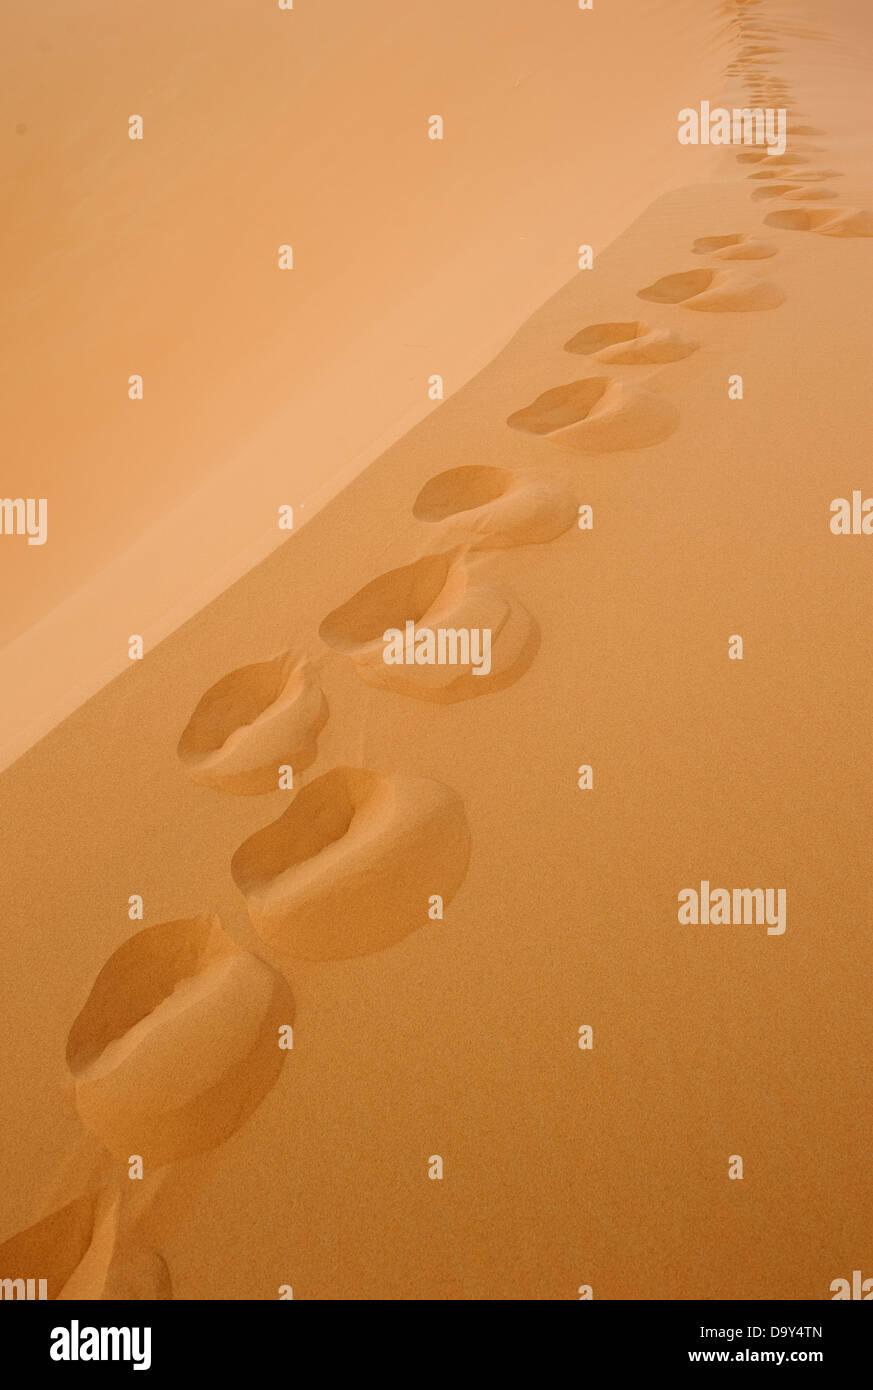 footprints in sand deseret - Stock Image